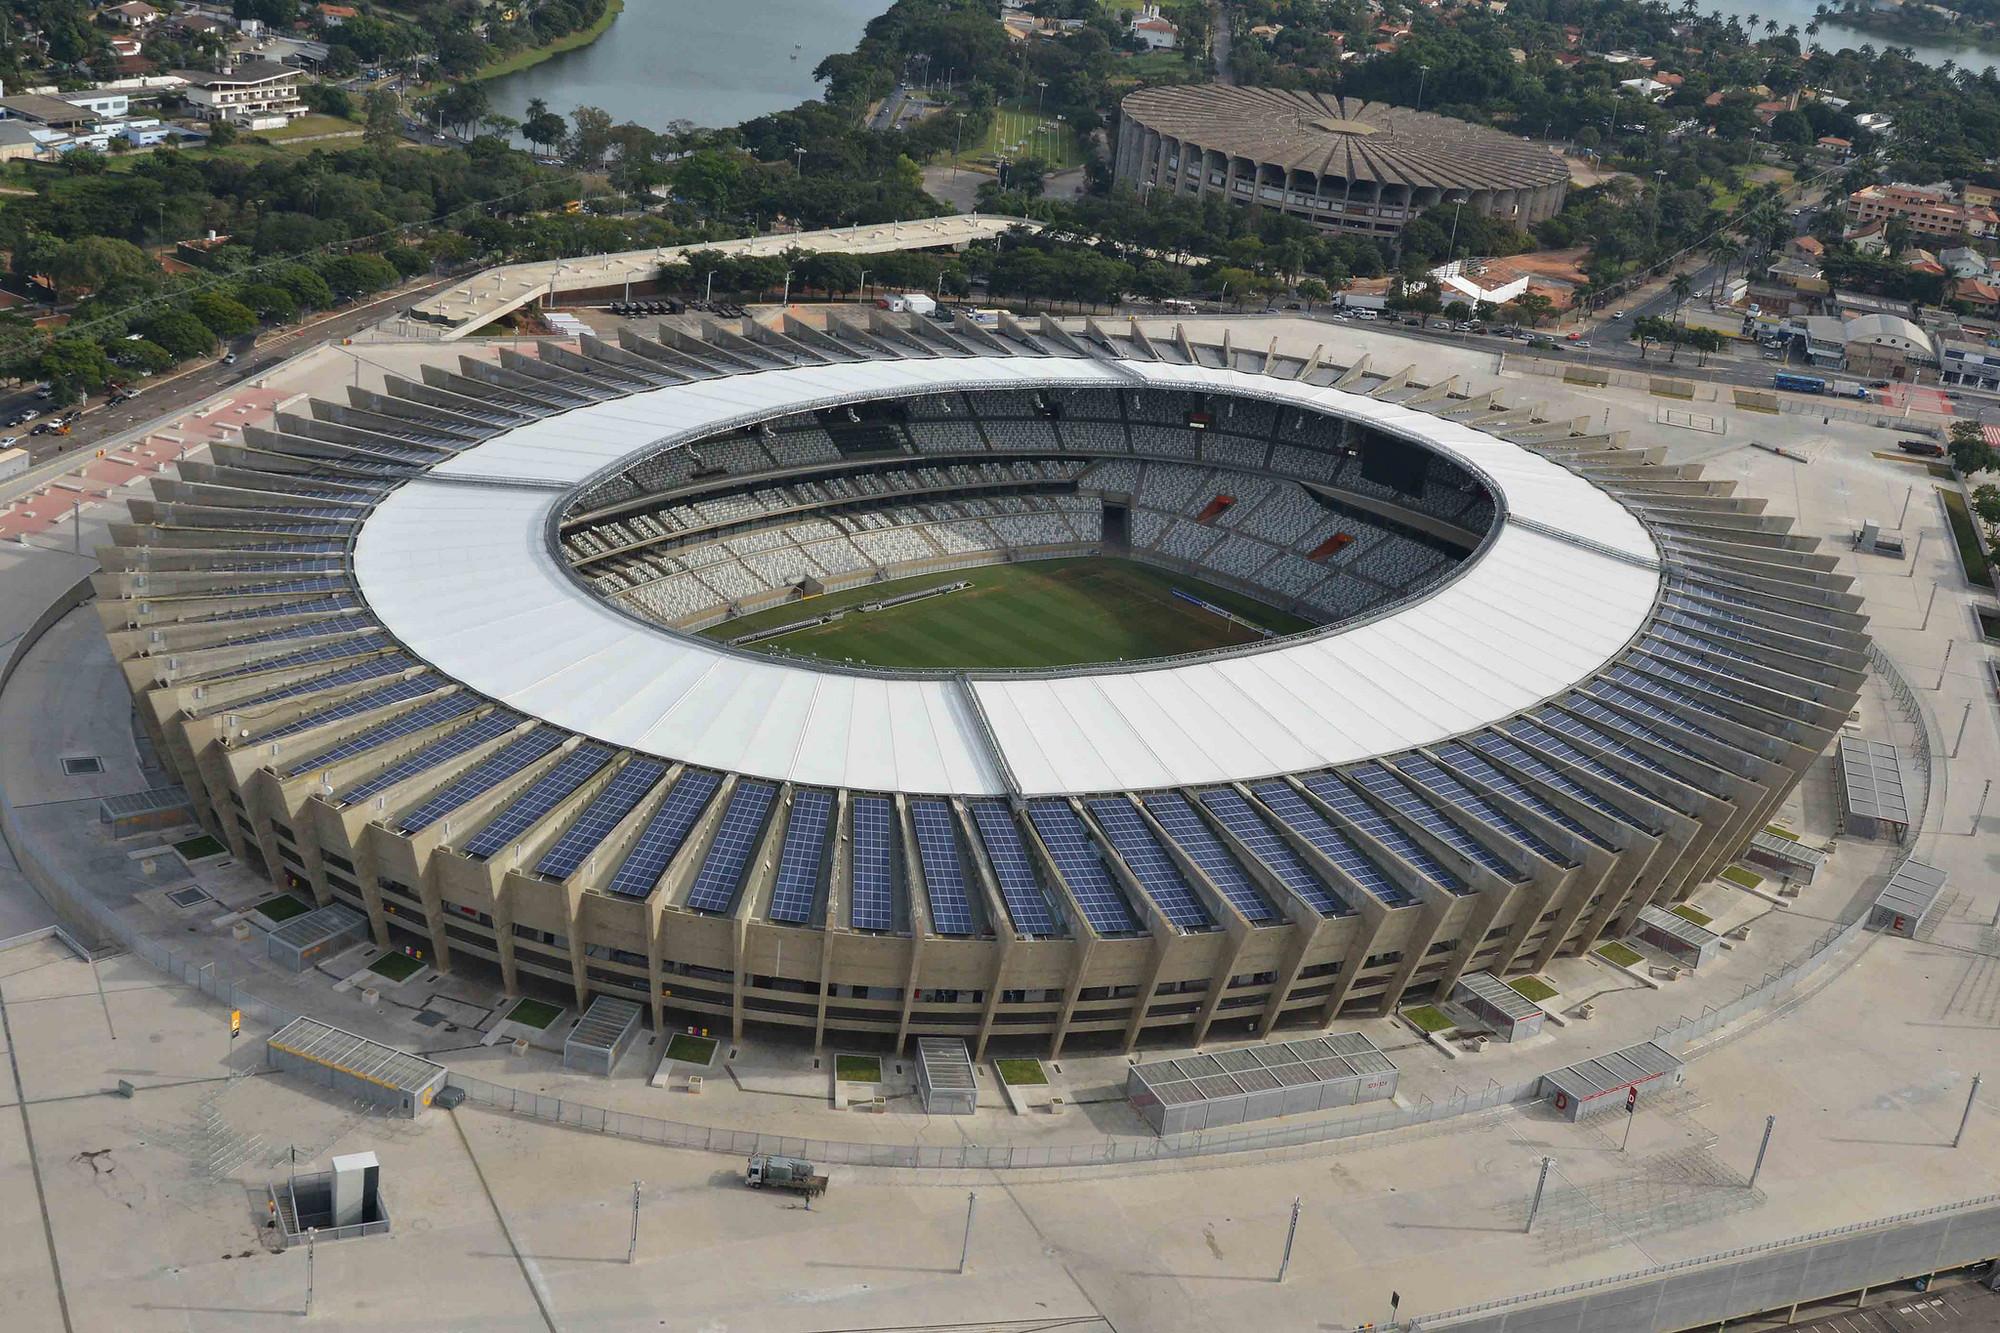 Rumbo al Mundial de Fútbol 2014: Brasil inaugura la nueva cubierta solar del Estadio Mineirão en Minas Gerais, © Luan SR